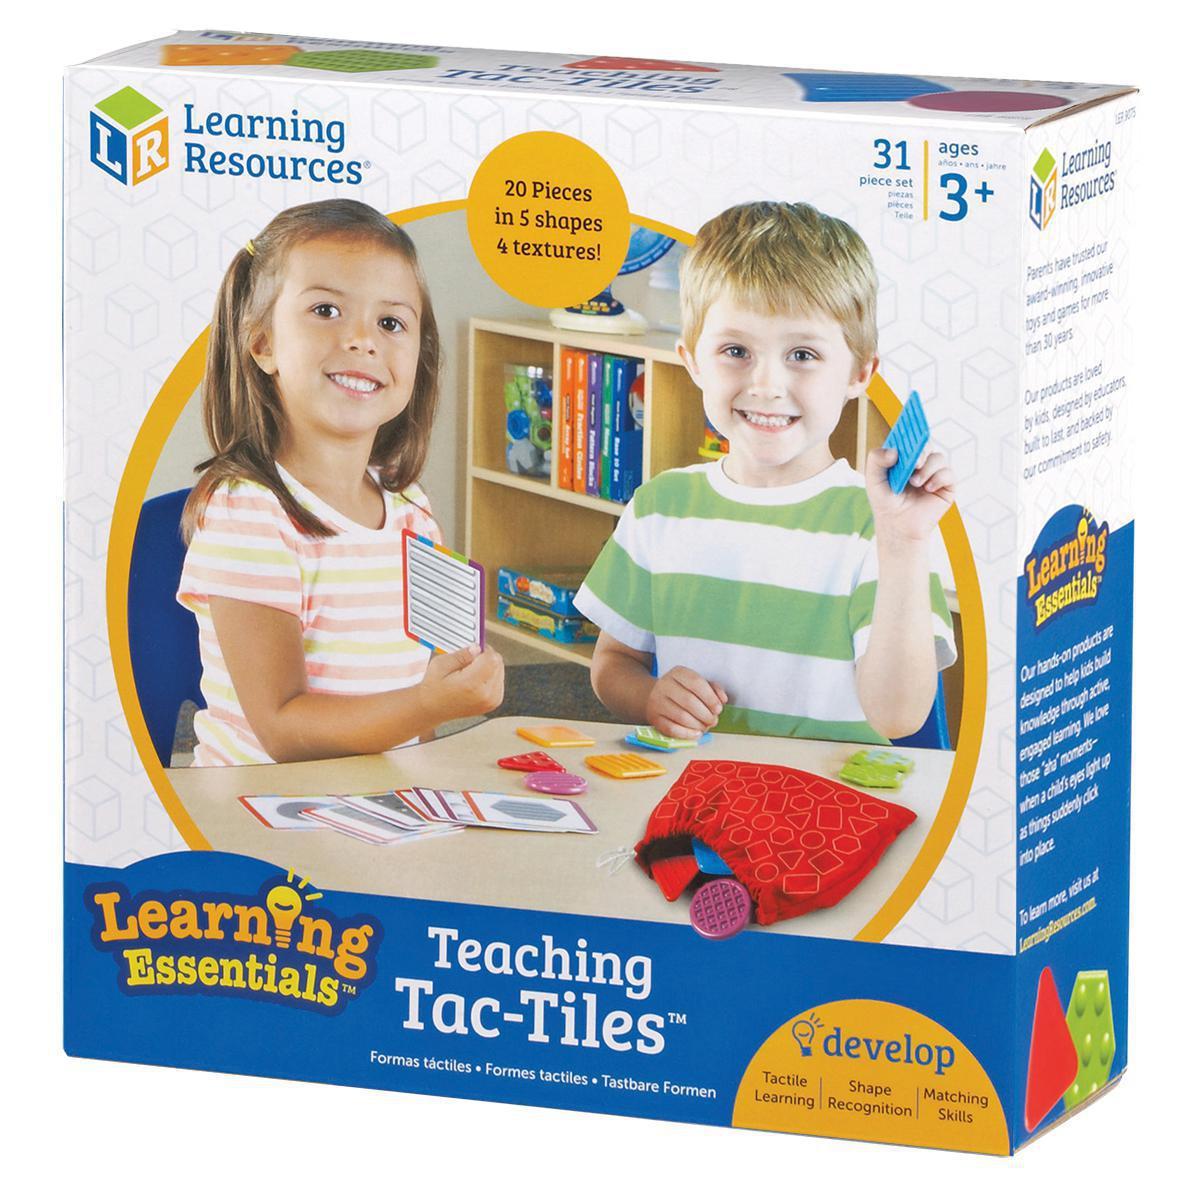 Teaching Tac-Tiles